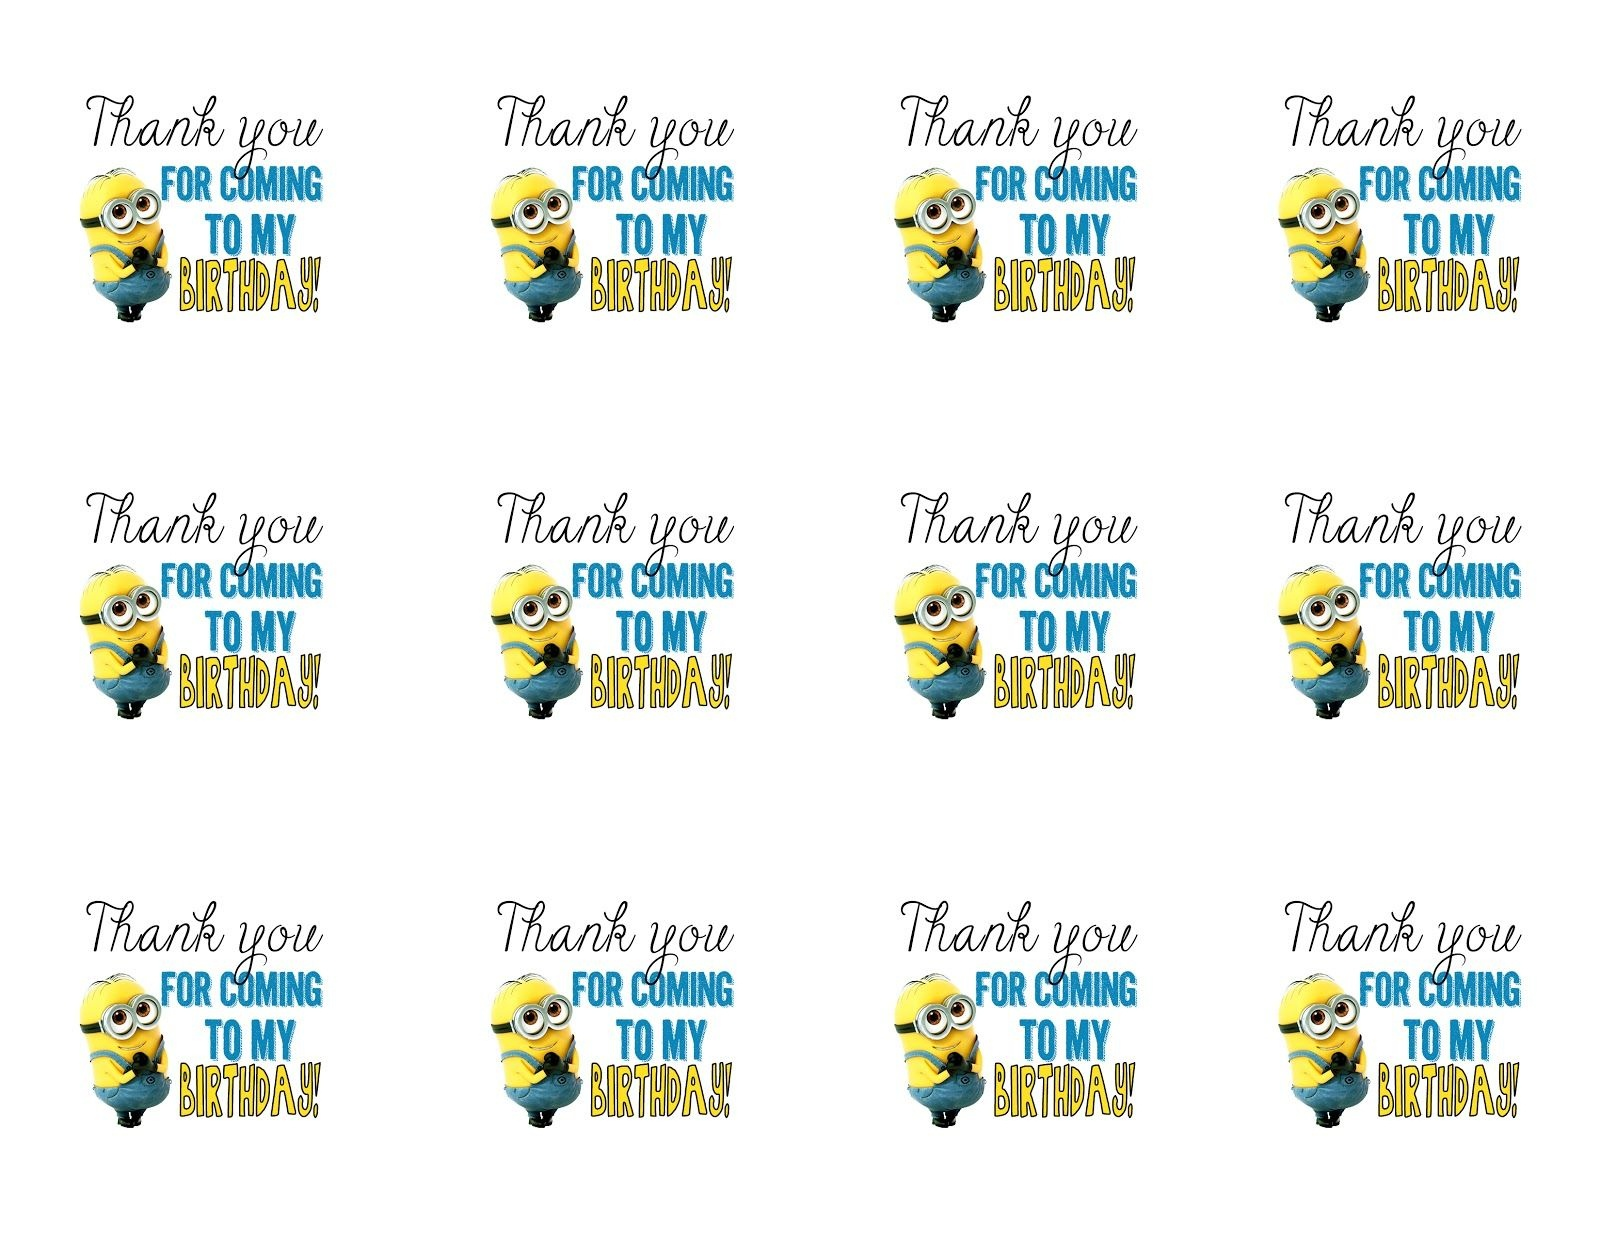 Diy Design Den: Minion Birthday Party With Free Printables - Free Printable Minion Food Labels